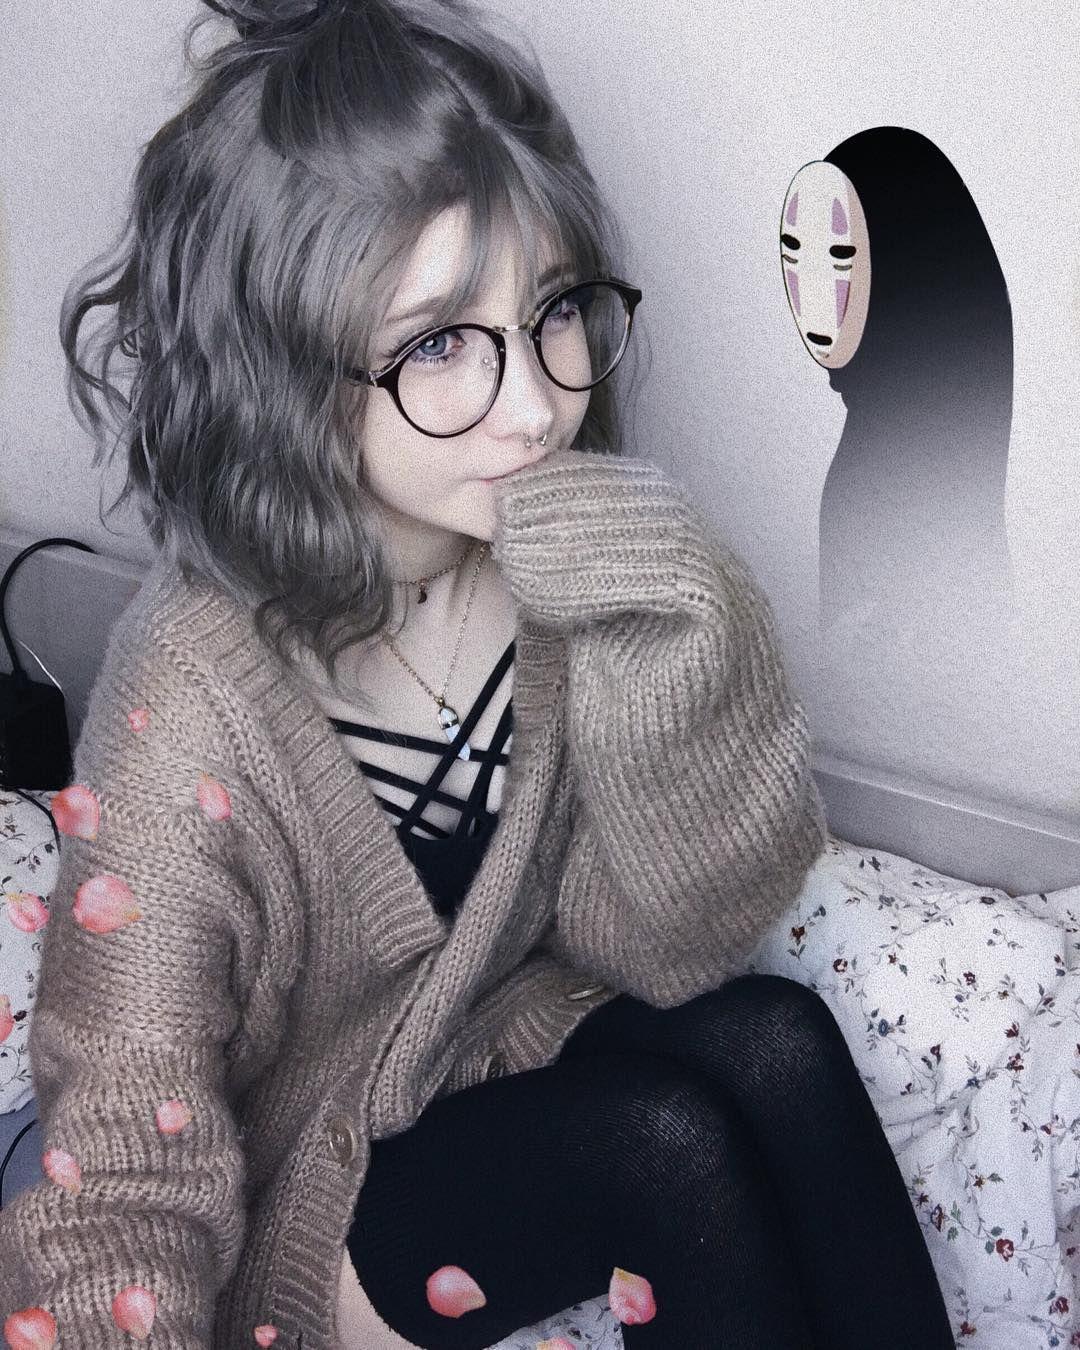 Larymei.jpg Garotas, Cabelo kawaii, Garotas de cabelo curto